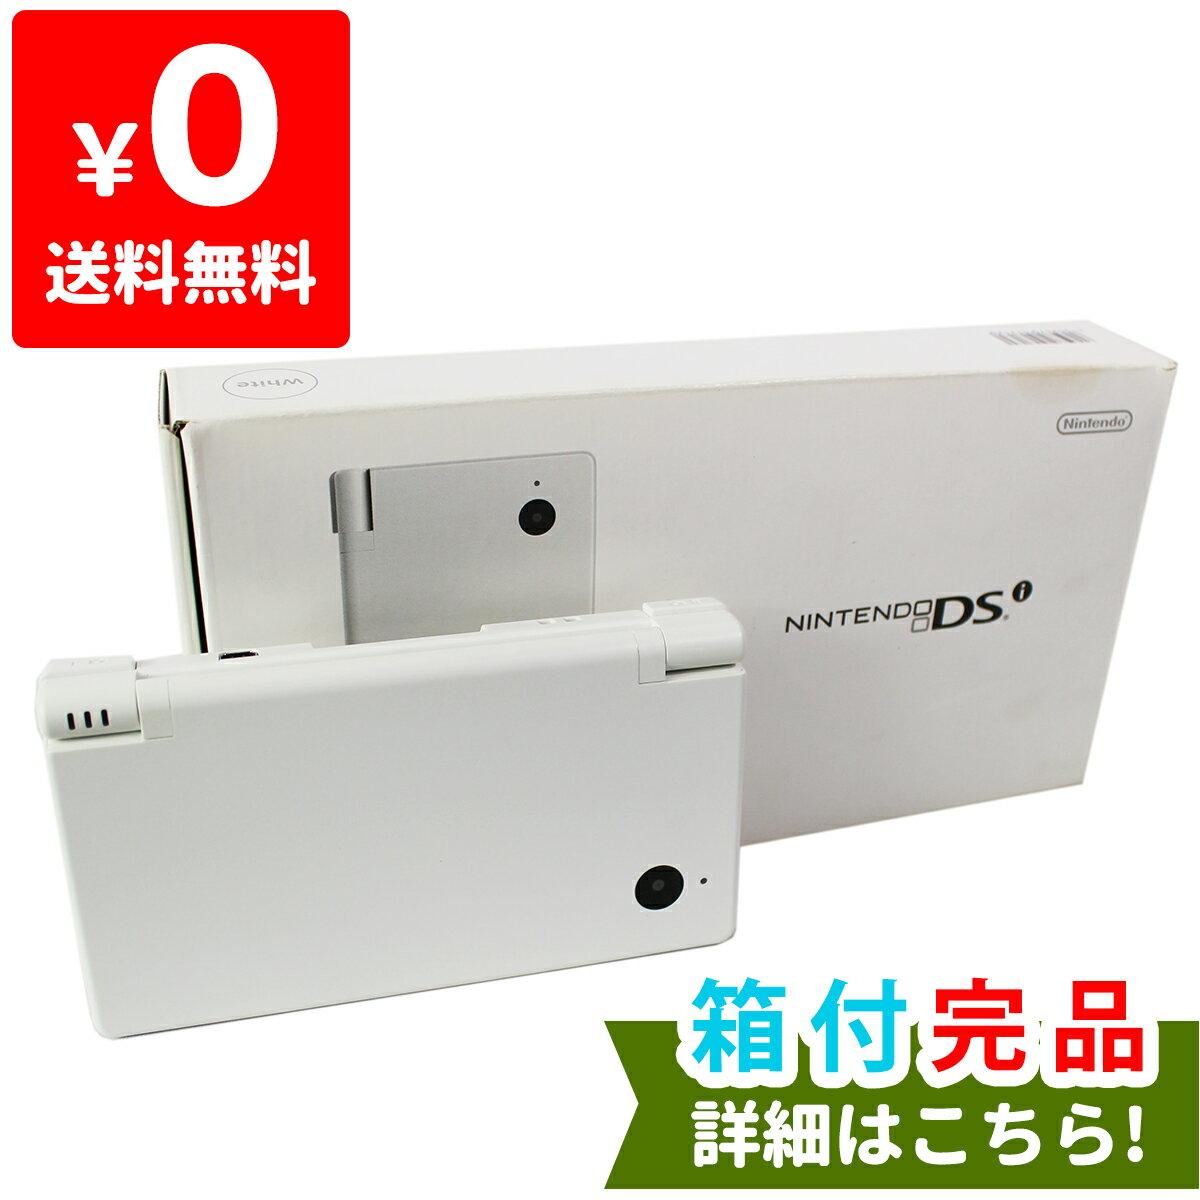 DSi ニンテンドーDSi ホワイト TWL-S-WA 本体 完品 外箱付き Nintendo 任天堂 ニンテンドー 中古 4902370517170 送料無料 【中古】